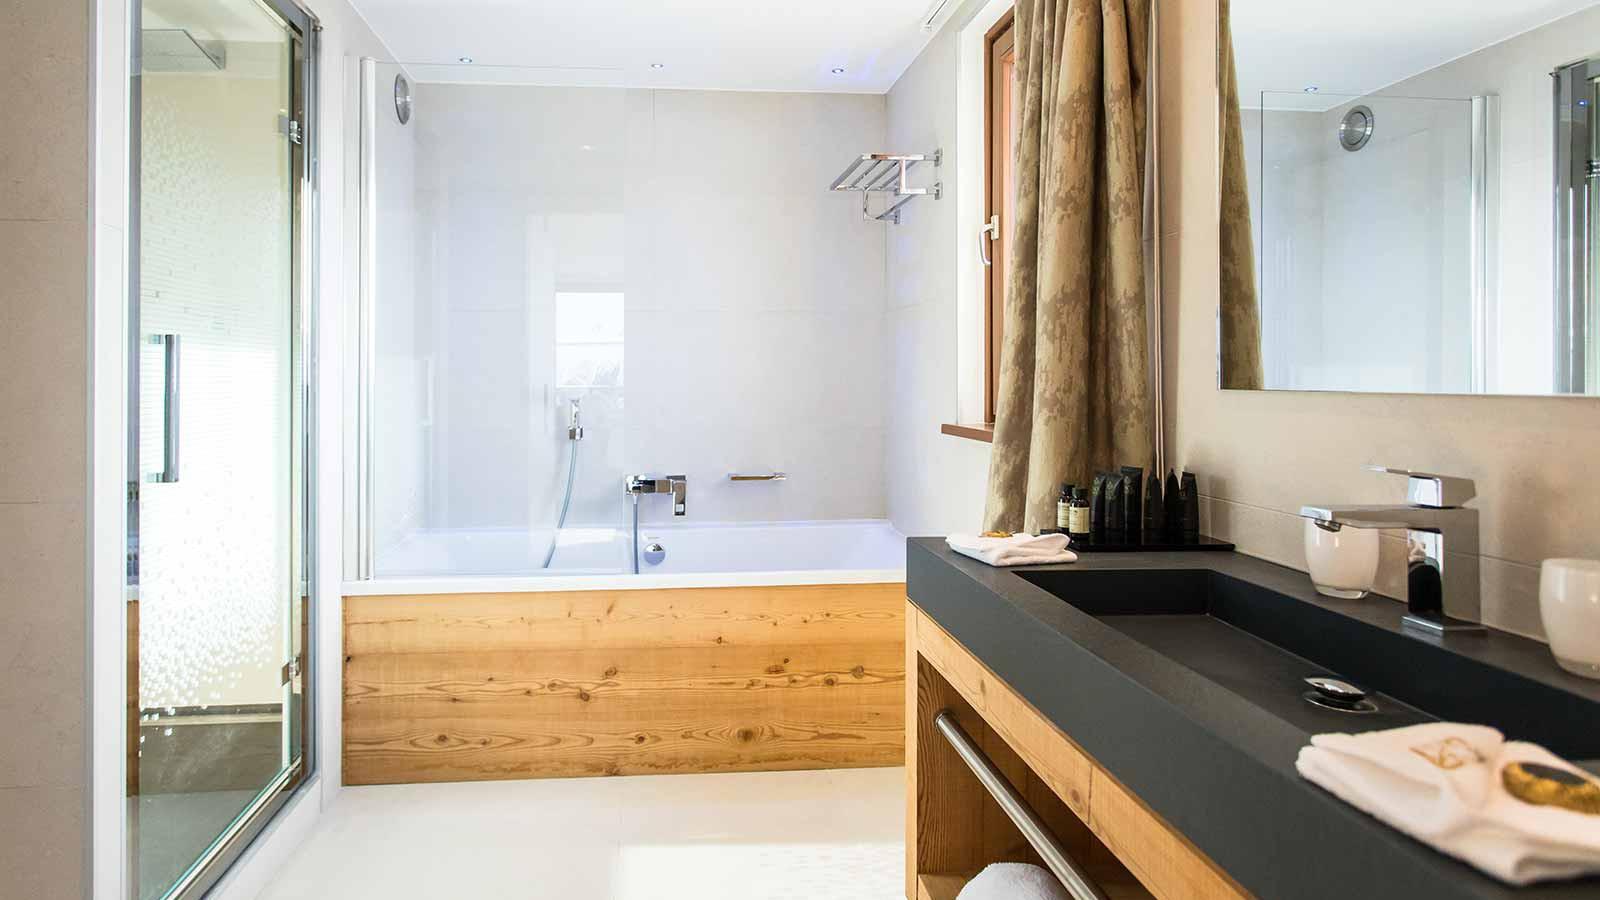 Daria-I Nor Hotel, Alpe D'Huez - Suite Bathroom